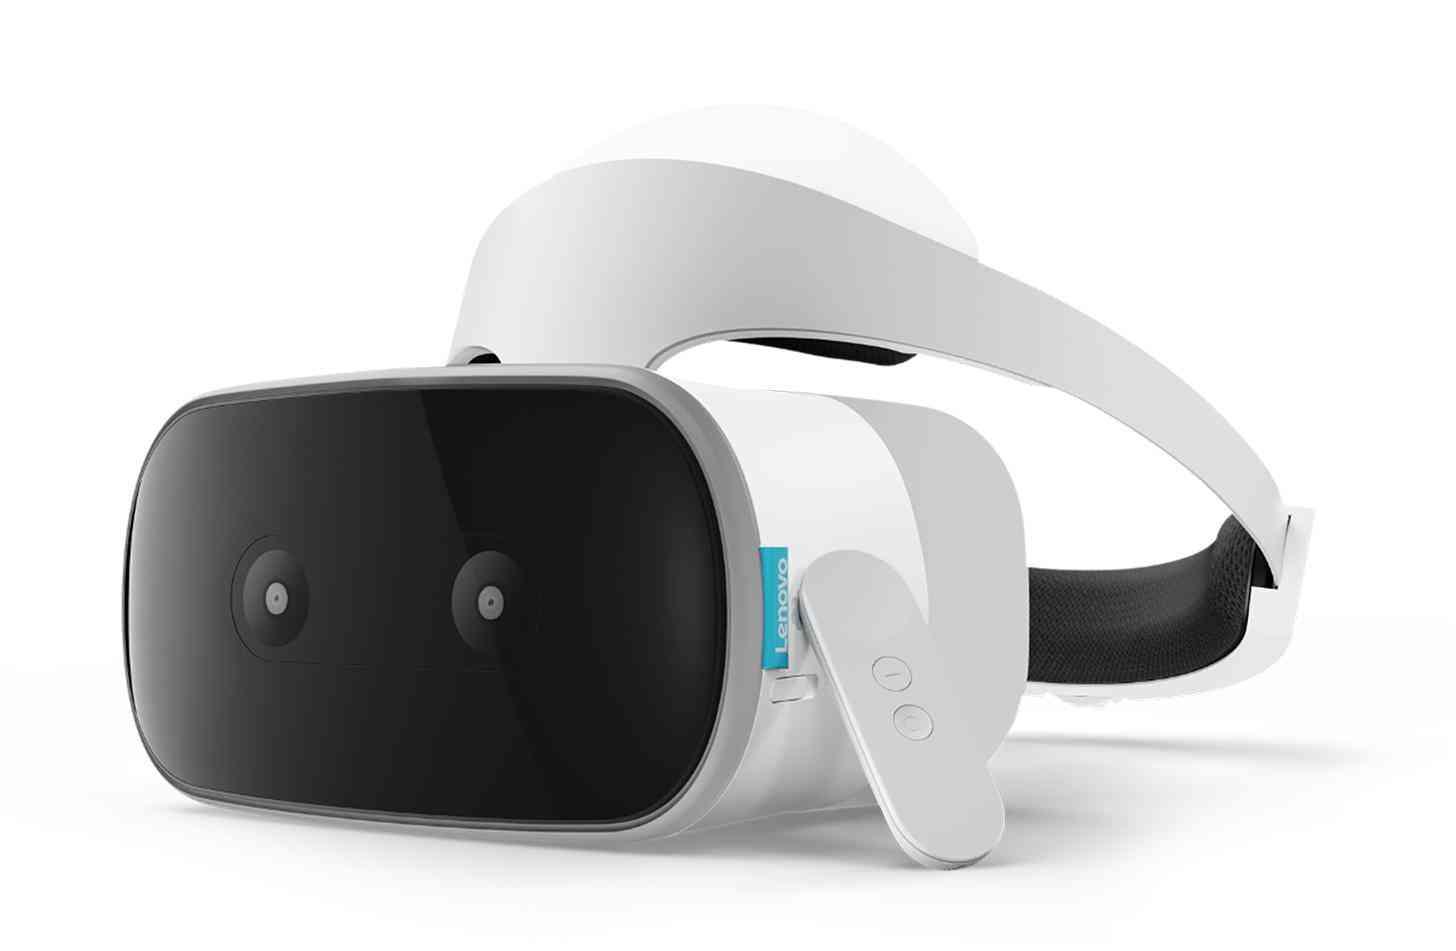 Lenovo Mirage Solo standalone Google Daydream VR headset